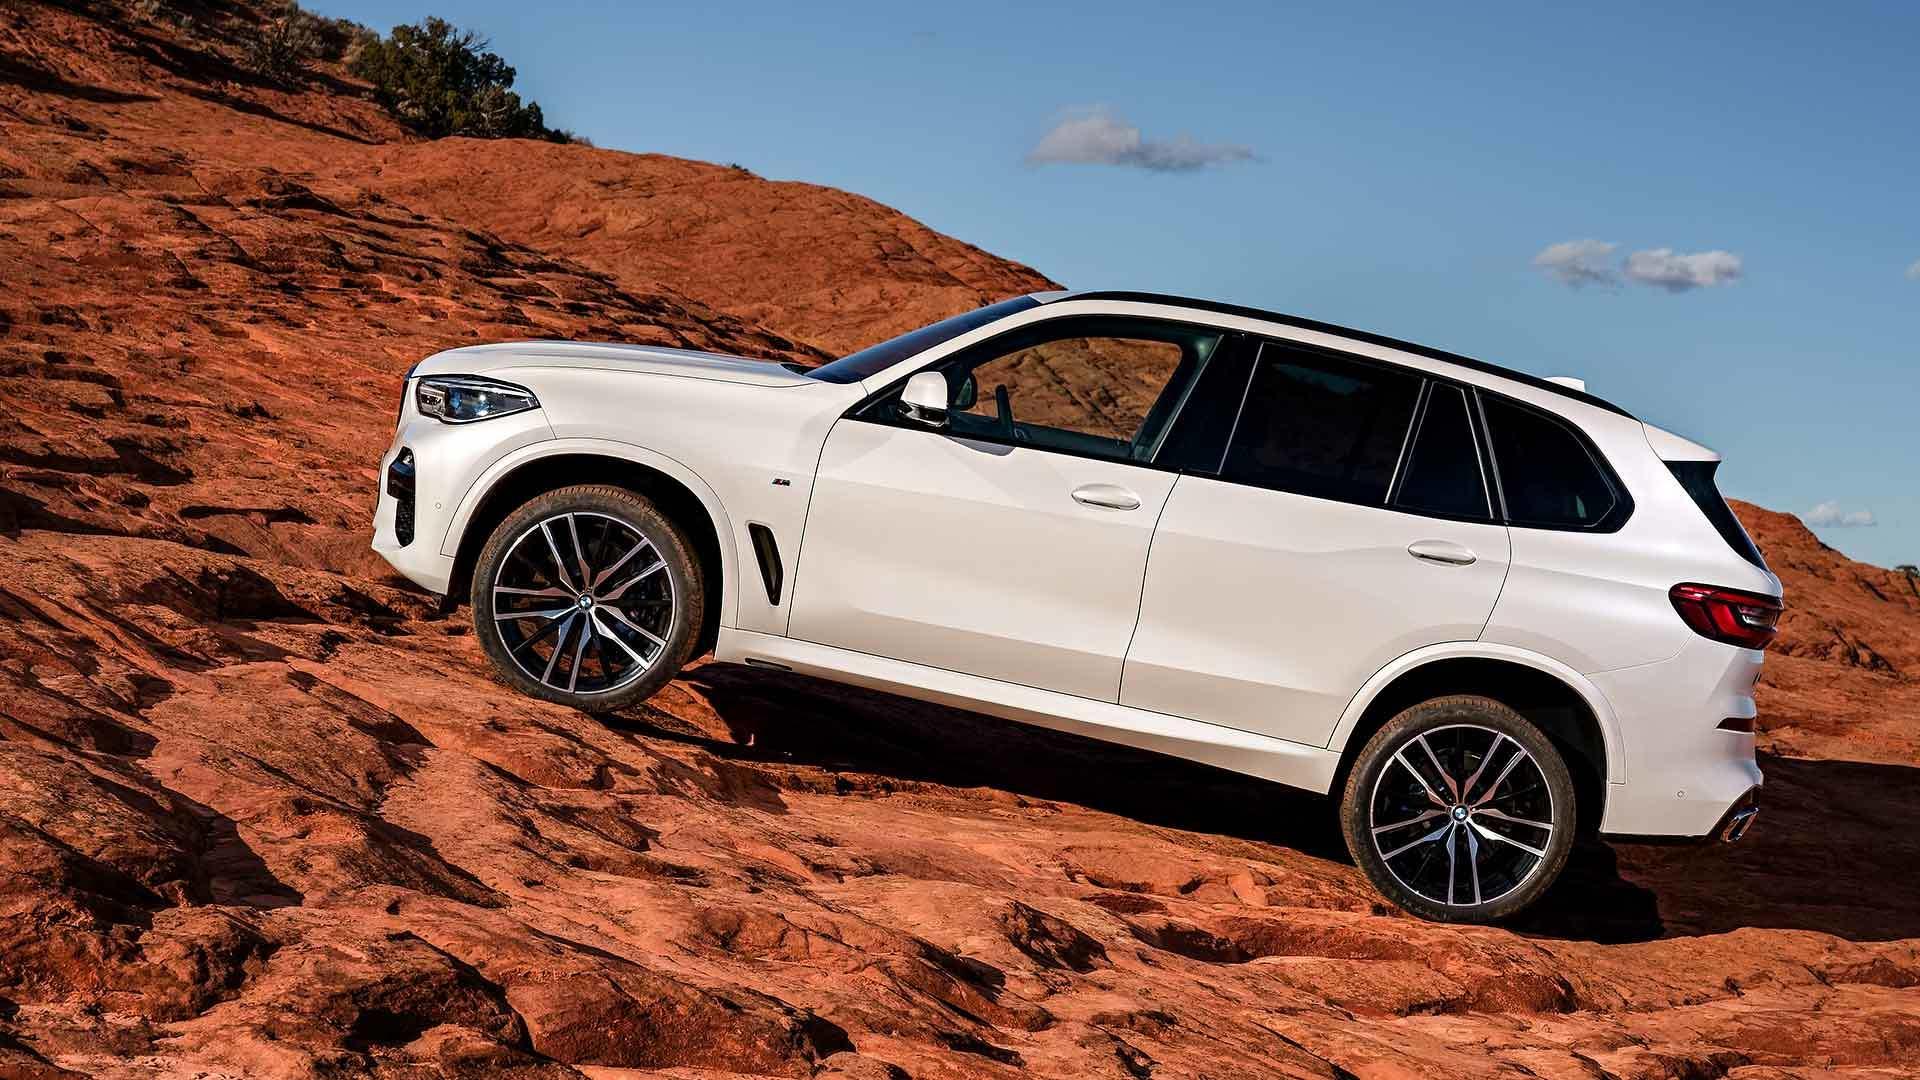 BMW-X5-G05-2019-9.jpg